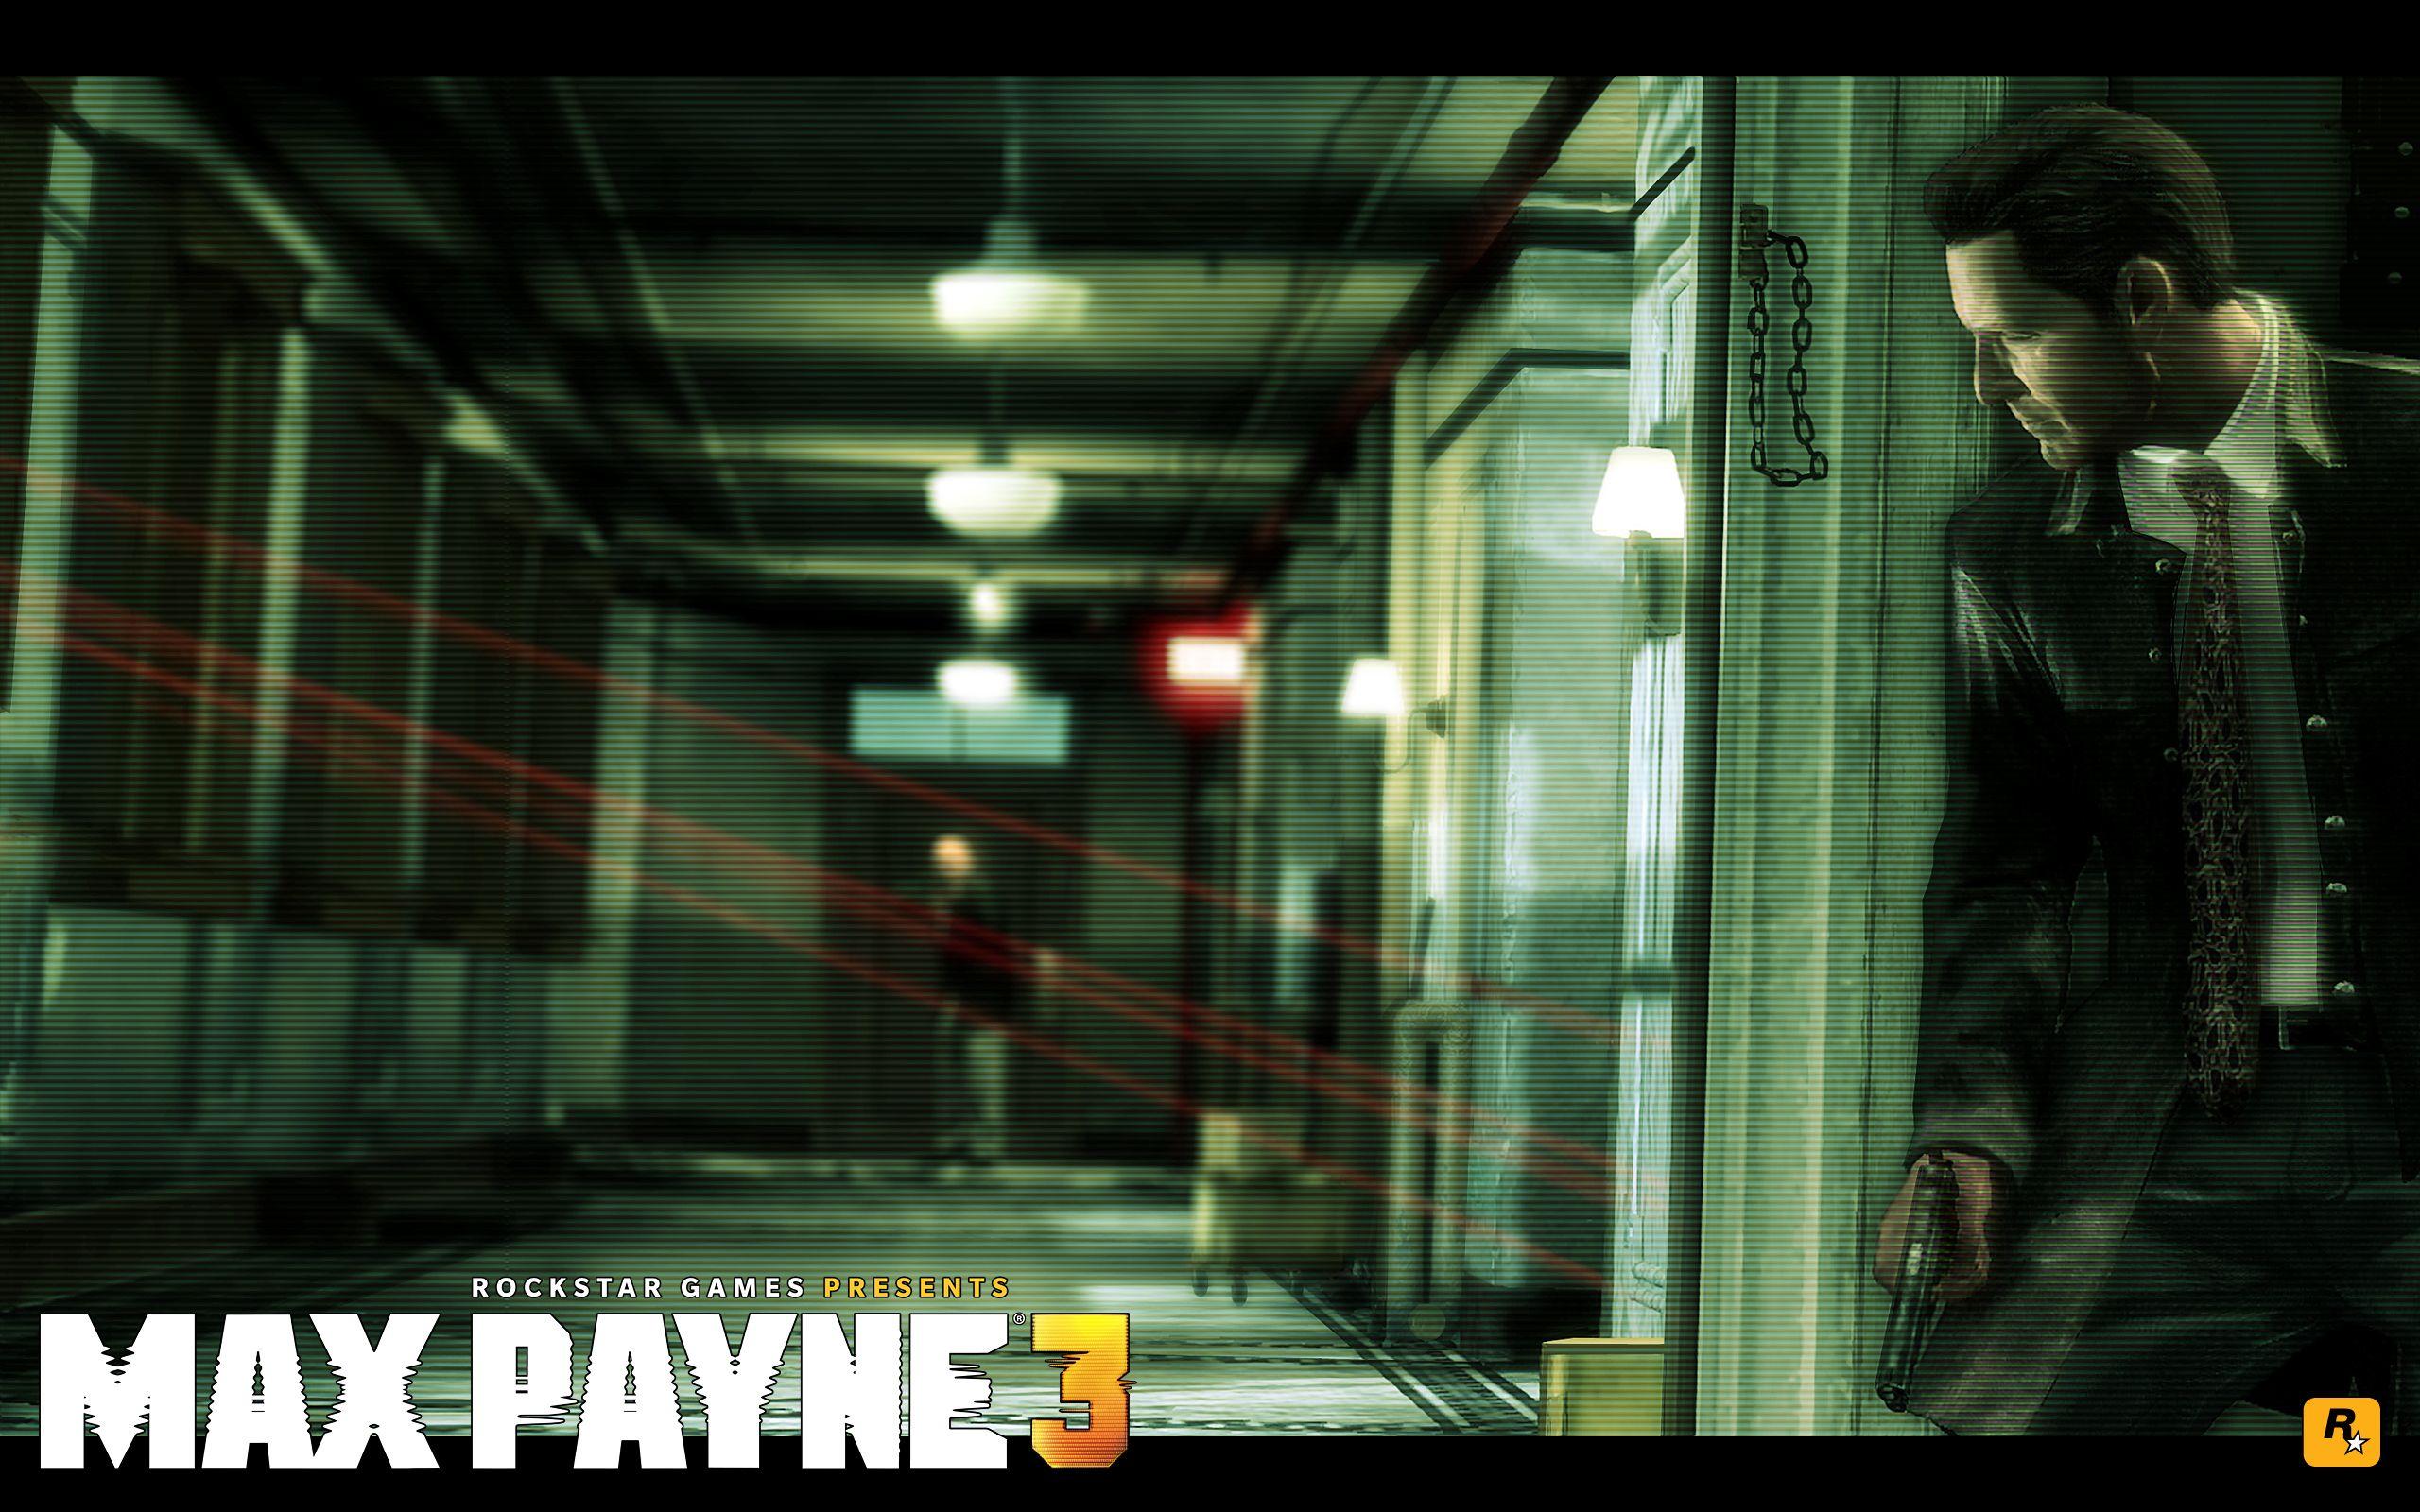 Great Wallpaper Movie Max Payne - 65d2b5225825432c45c5577a1371ab3b  2018_682886.jpg